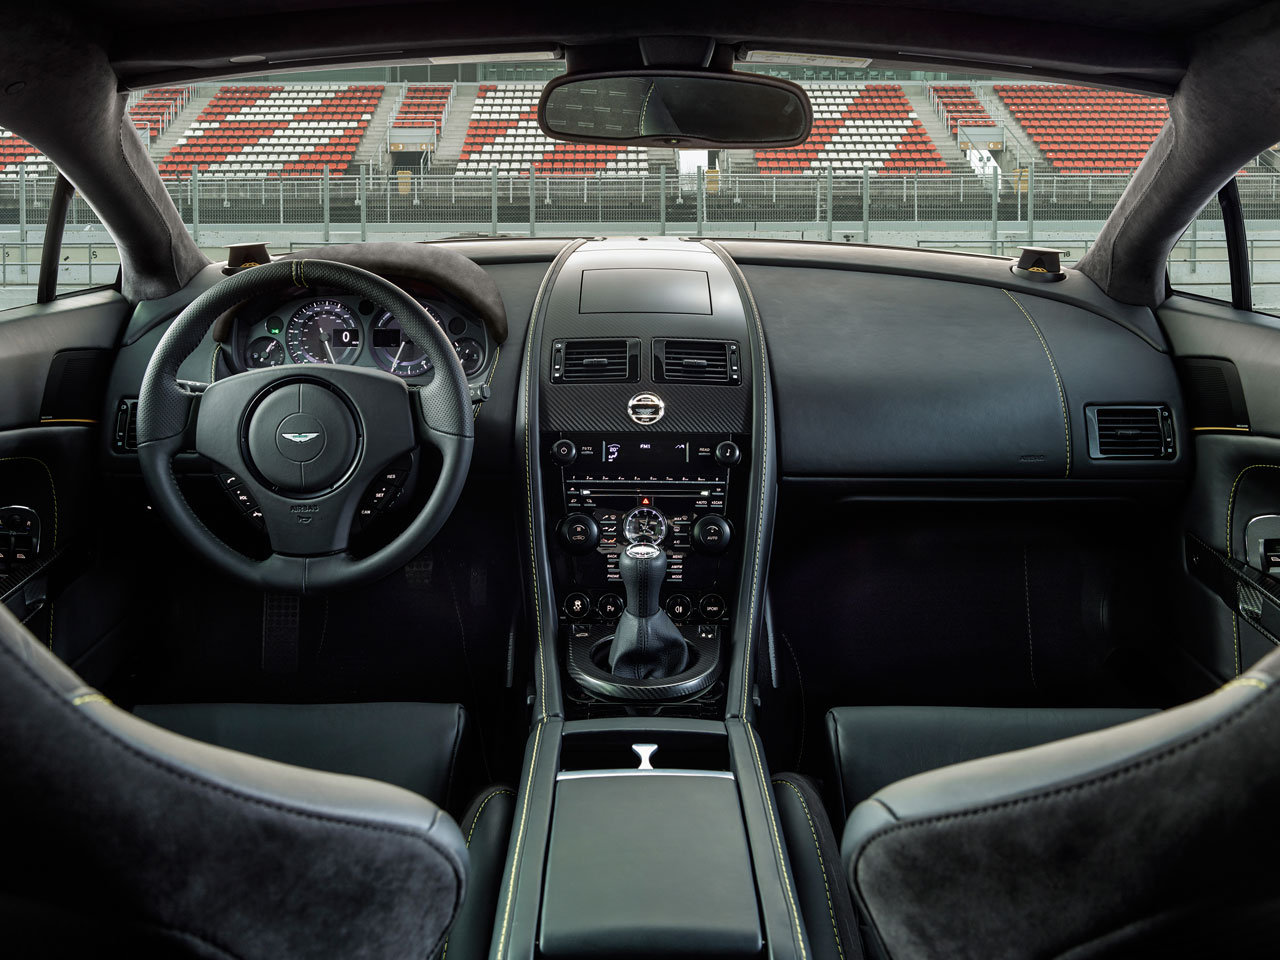 Aston Martin V8 Vantage N430 dash